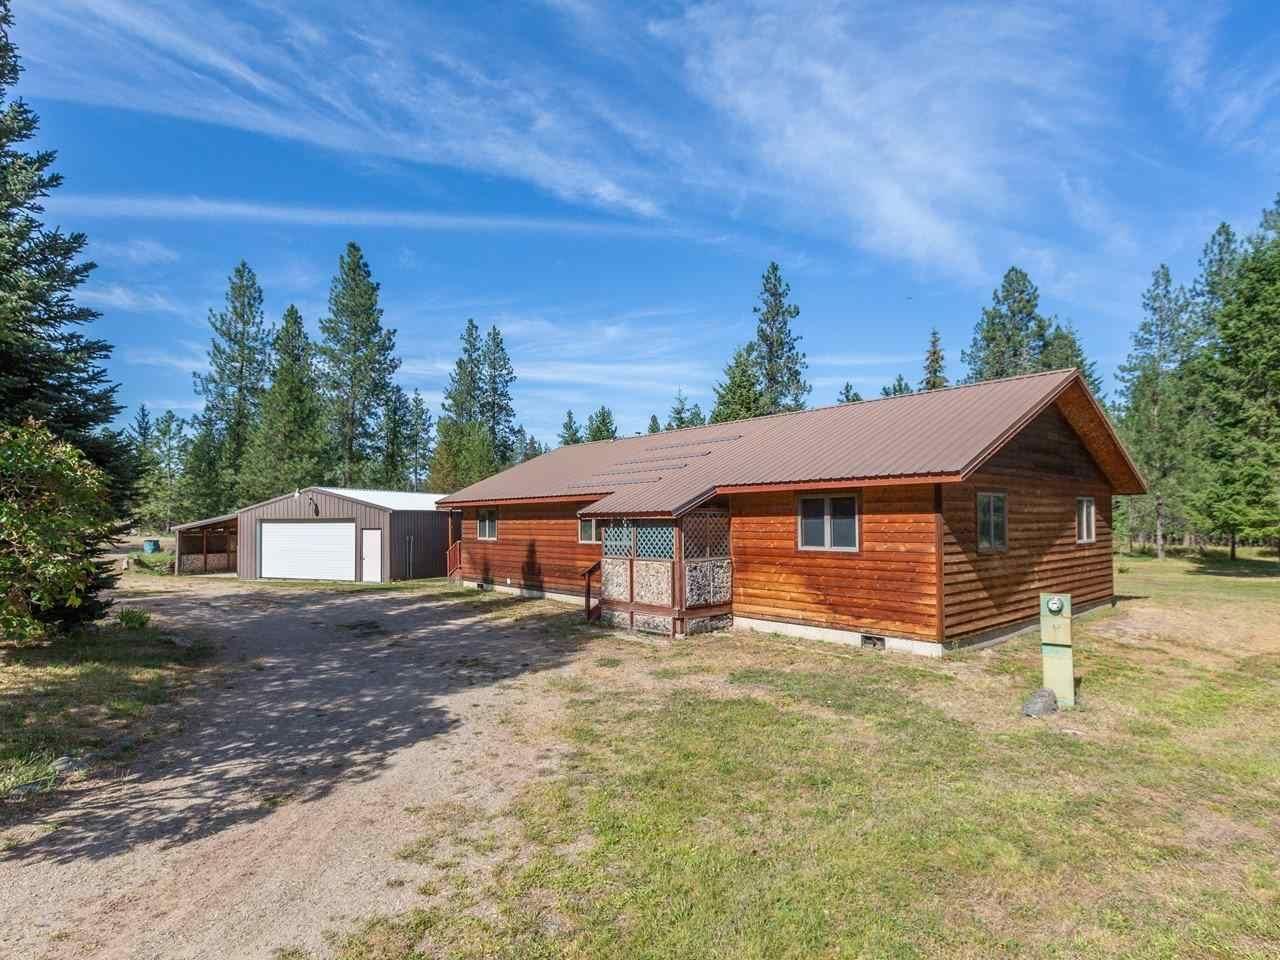 13315 E Oregon Rd, Elk, WA 99009-8708 - #: 202019825